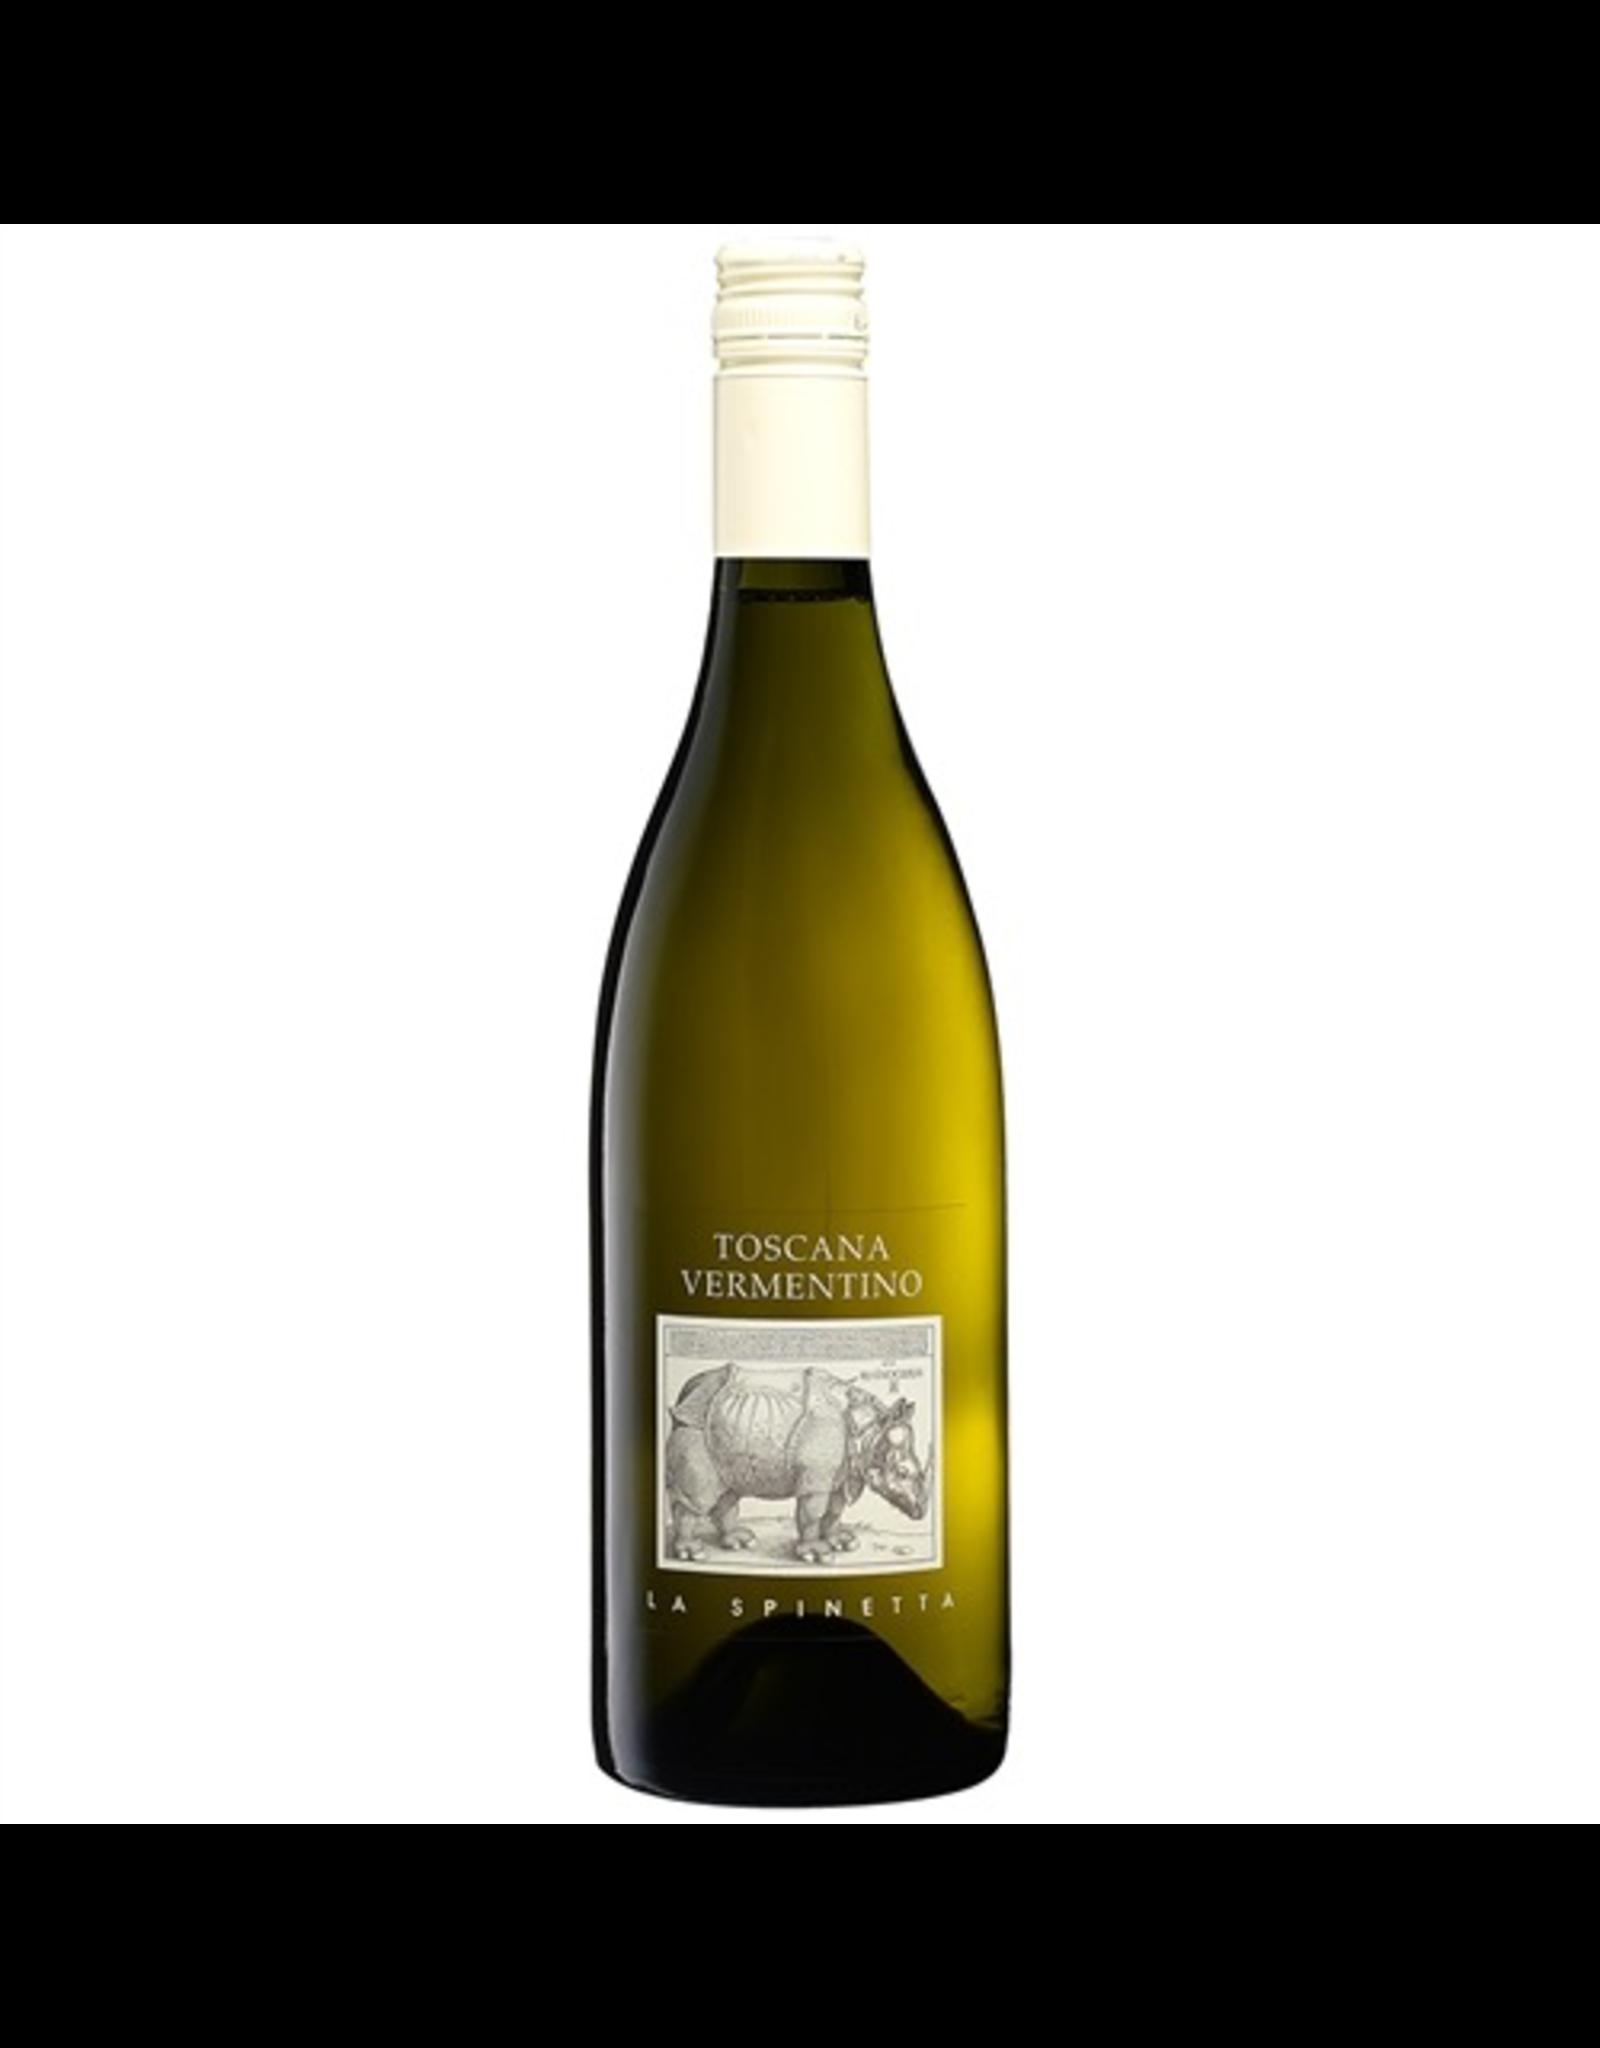 White Wine 2019, La Spinetta Tuscan White, Vermentino, Toscana, Tuscany, Italy, 13% Alc, CTnr, TW93